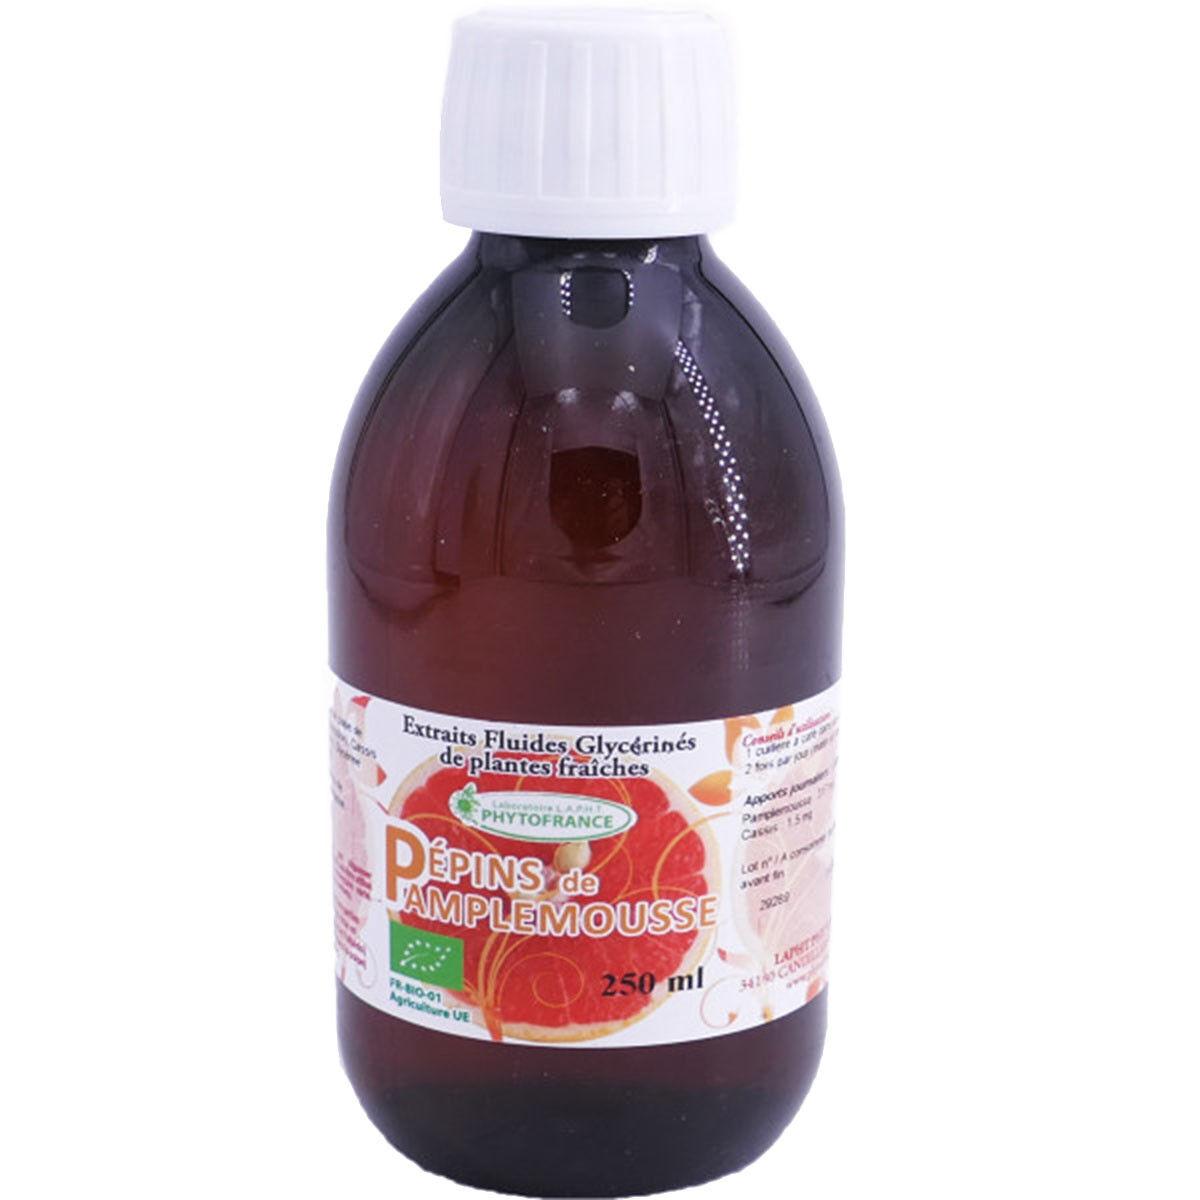 Phytofrance pÉpins de pamplemousse 250 ml